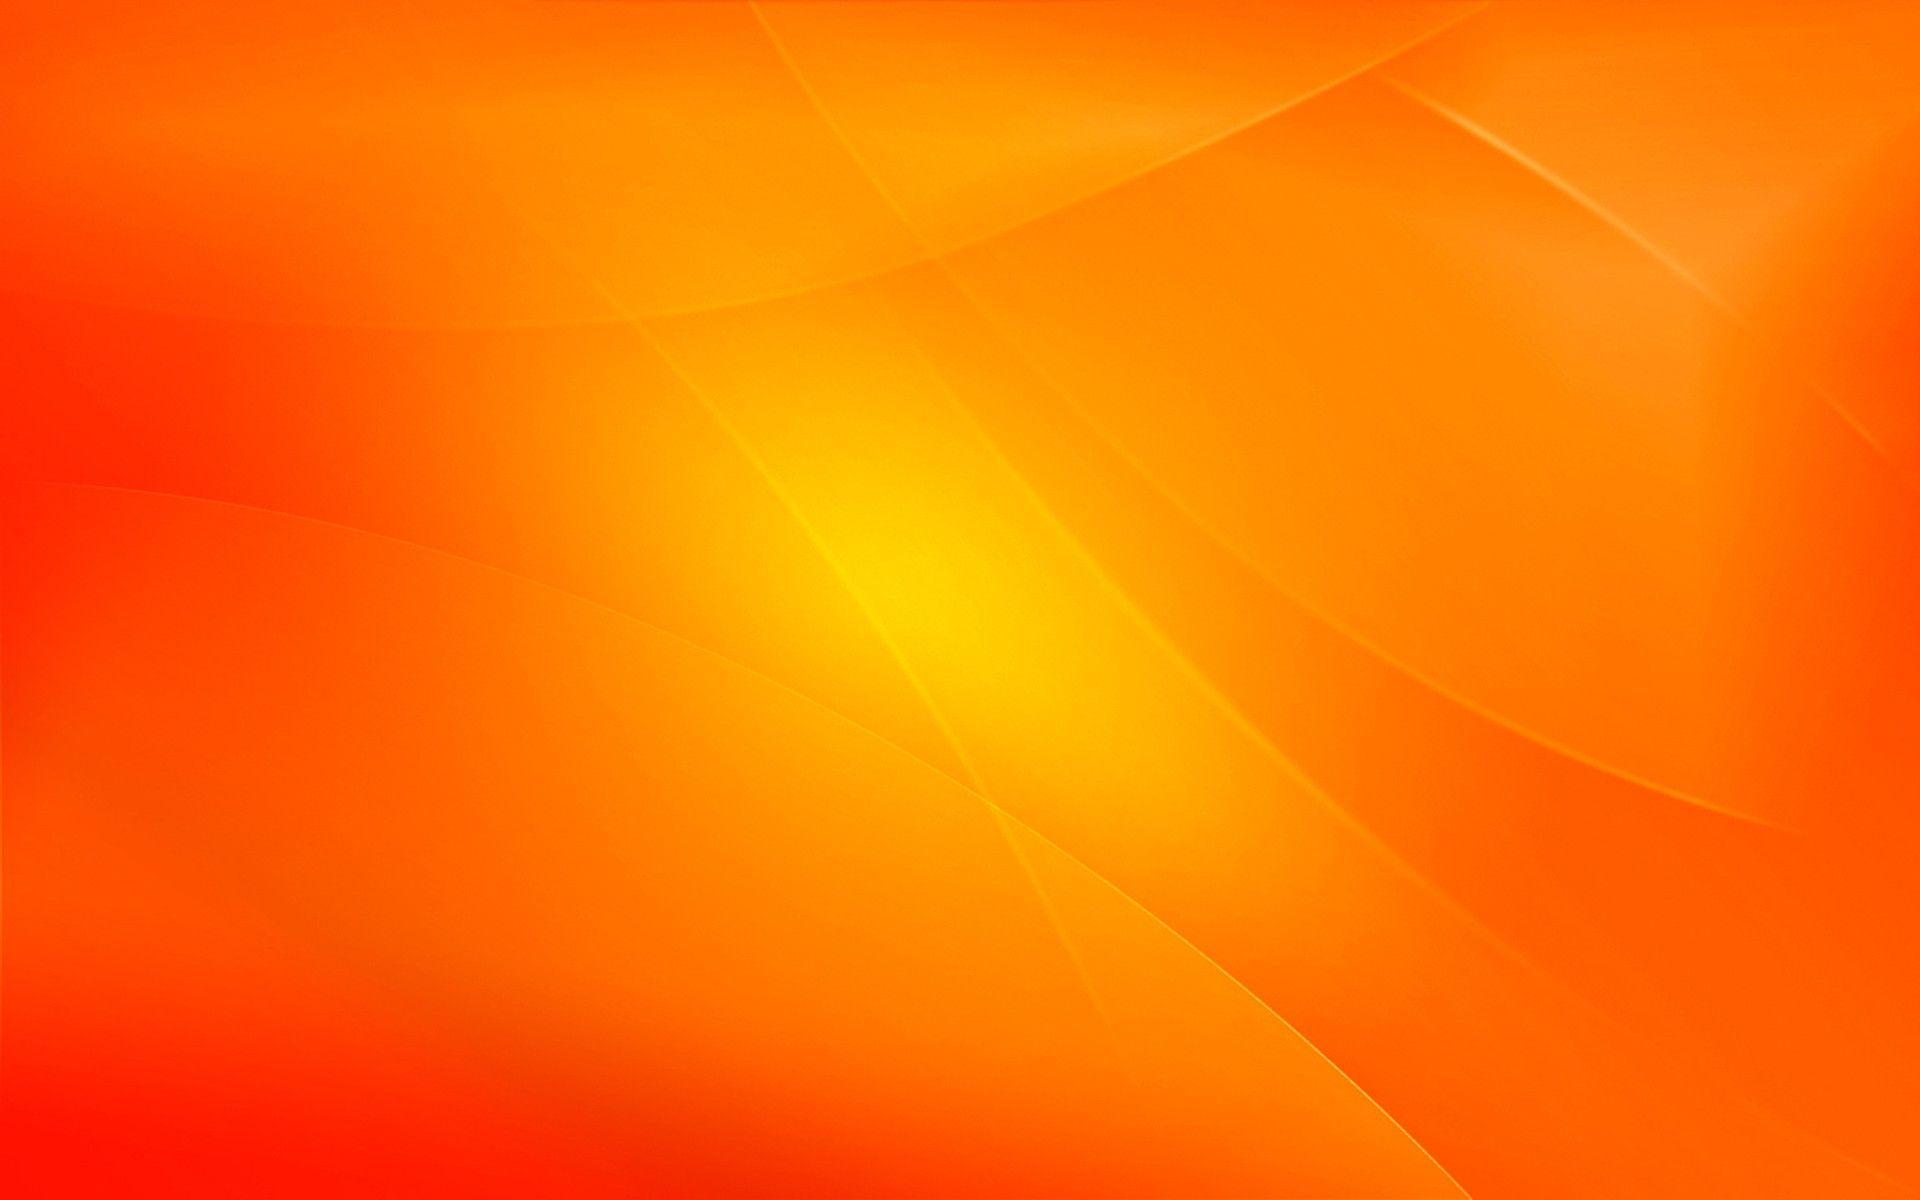 Wallpapers Orange Wallpaper Cave